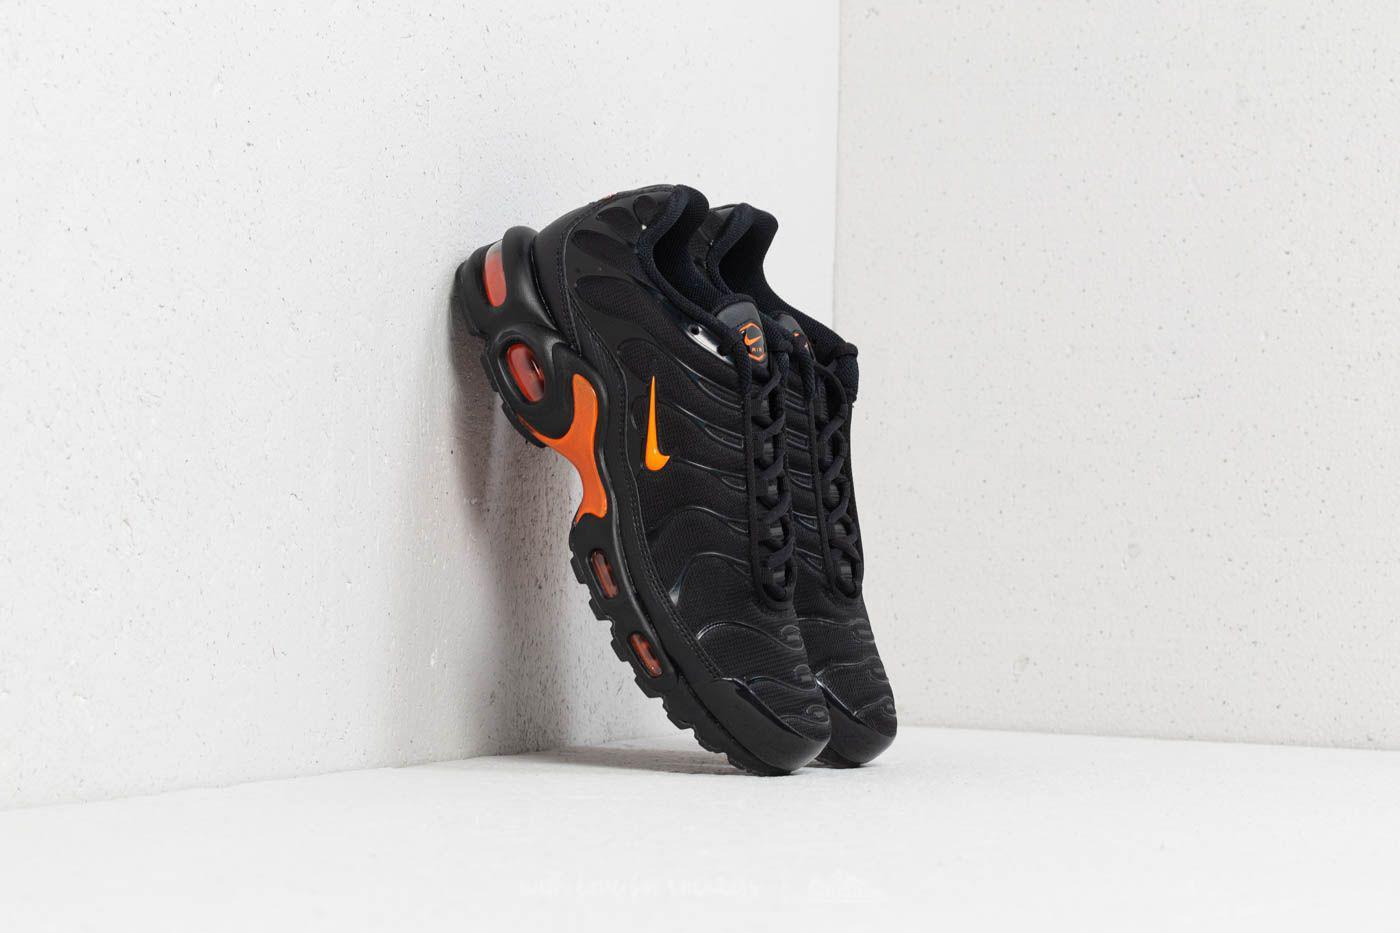 Lyst - Nike Air Max Plus Tn Se Black  Total Orange in Black for Men 9bde1a556